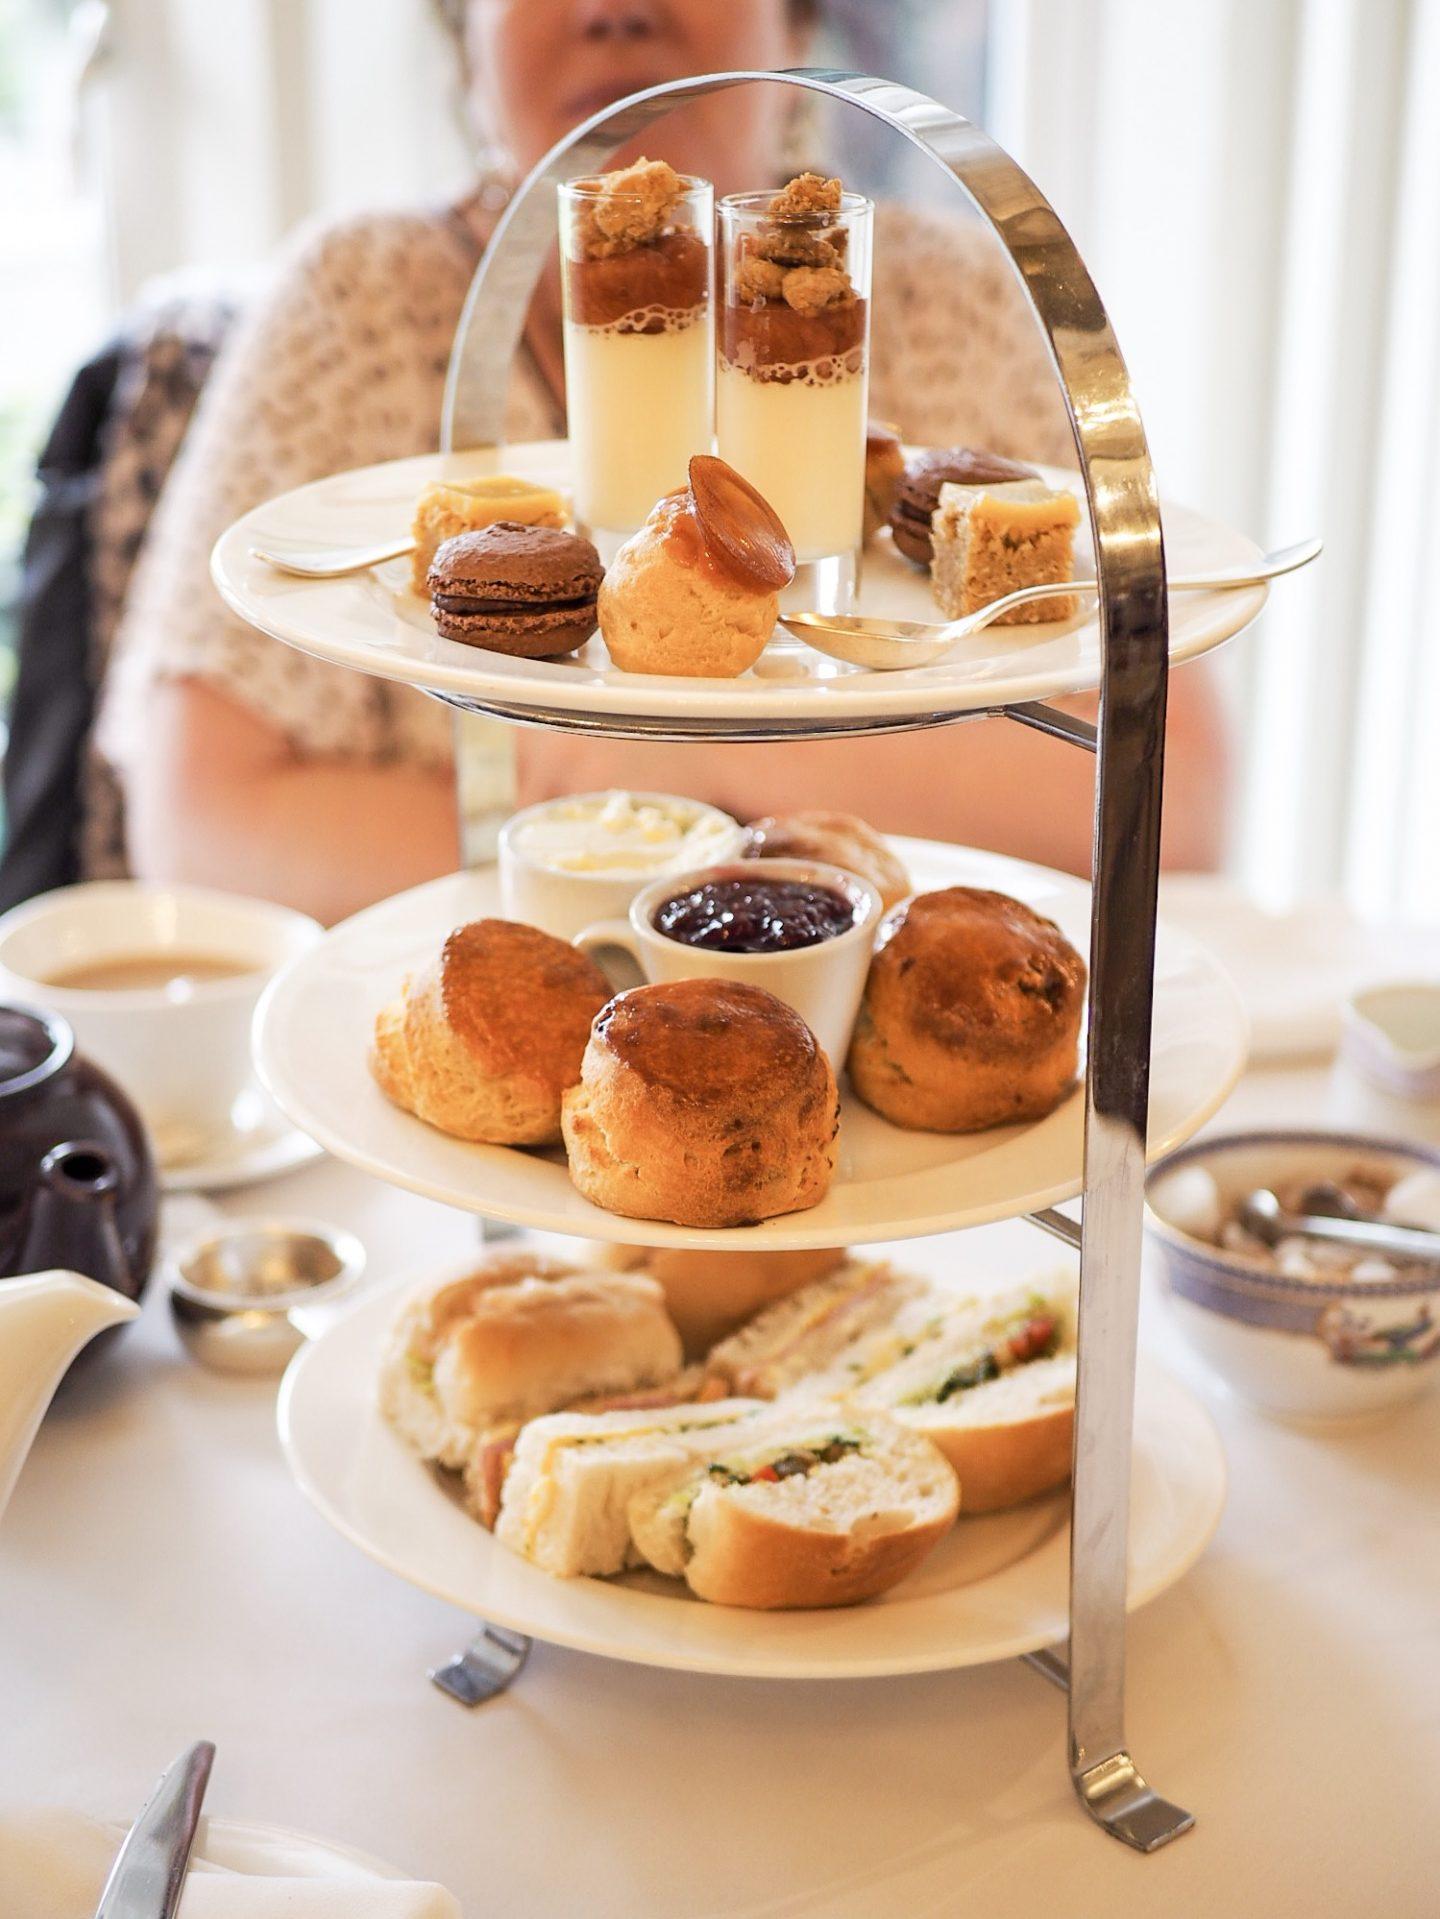 Berwick lodge full afternoon tea